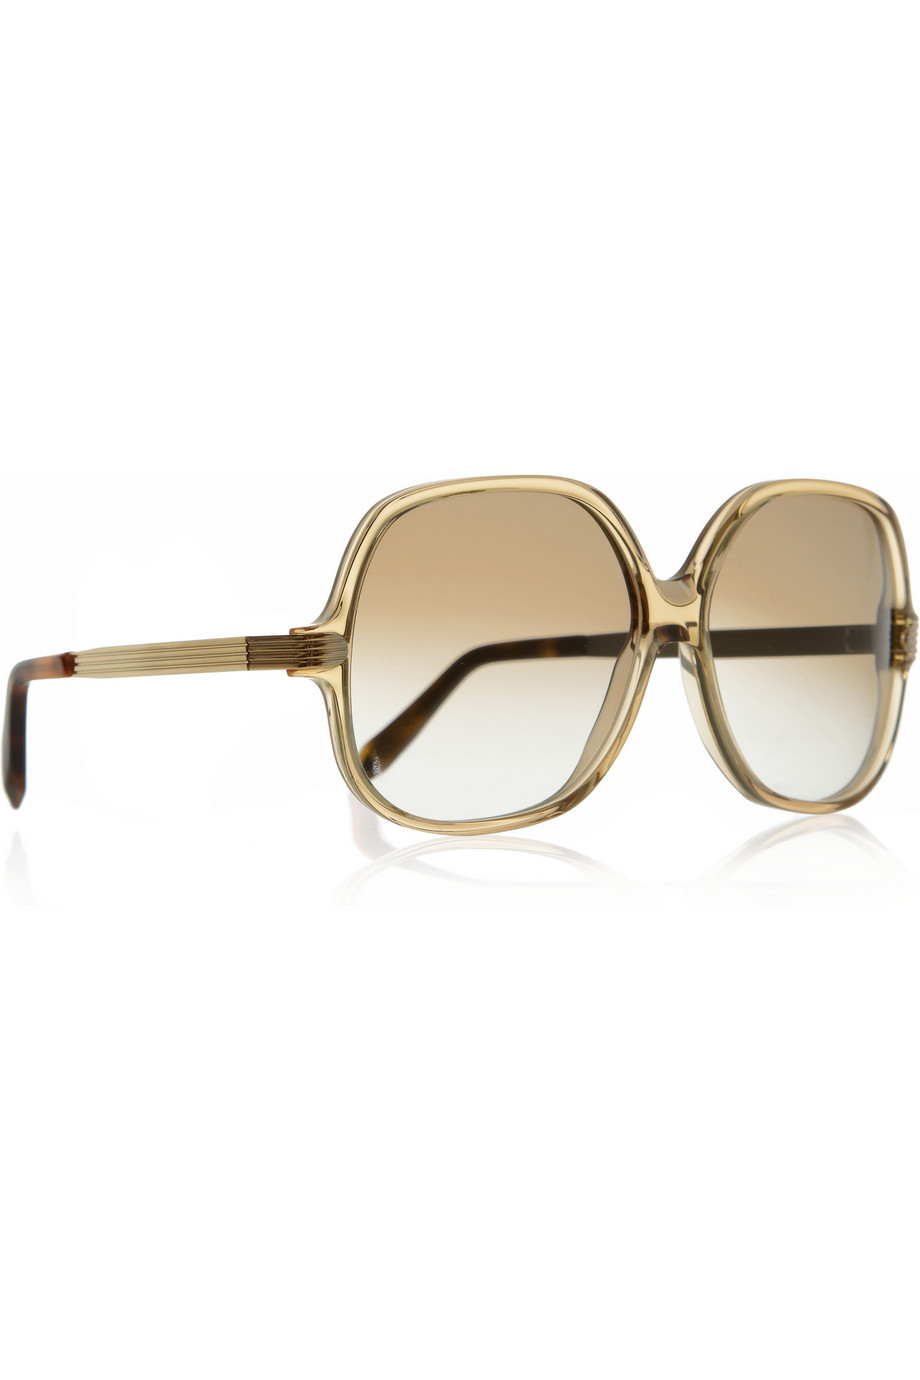 Victoria Beckham Square-Frame Acetate Sunglasses in Gold ...